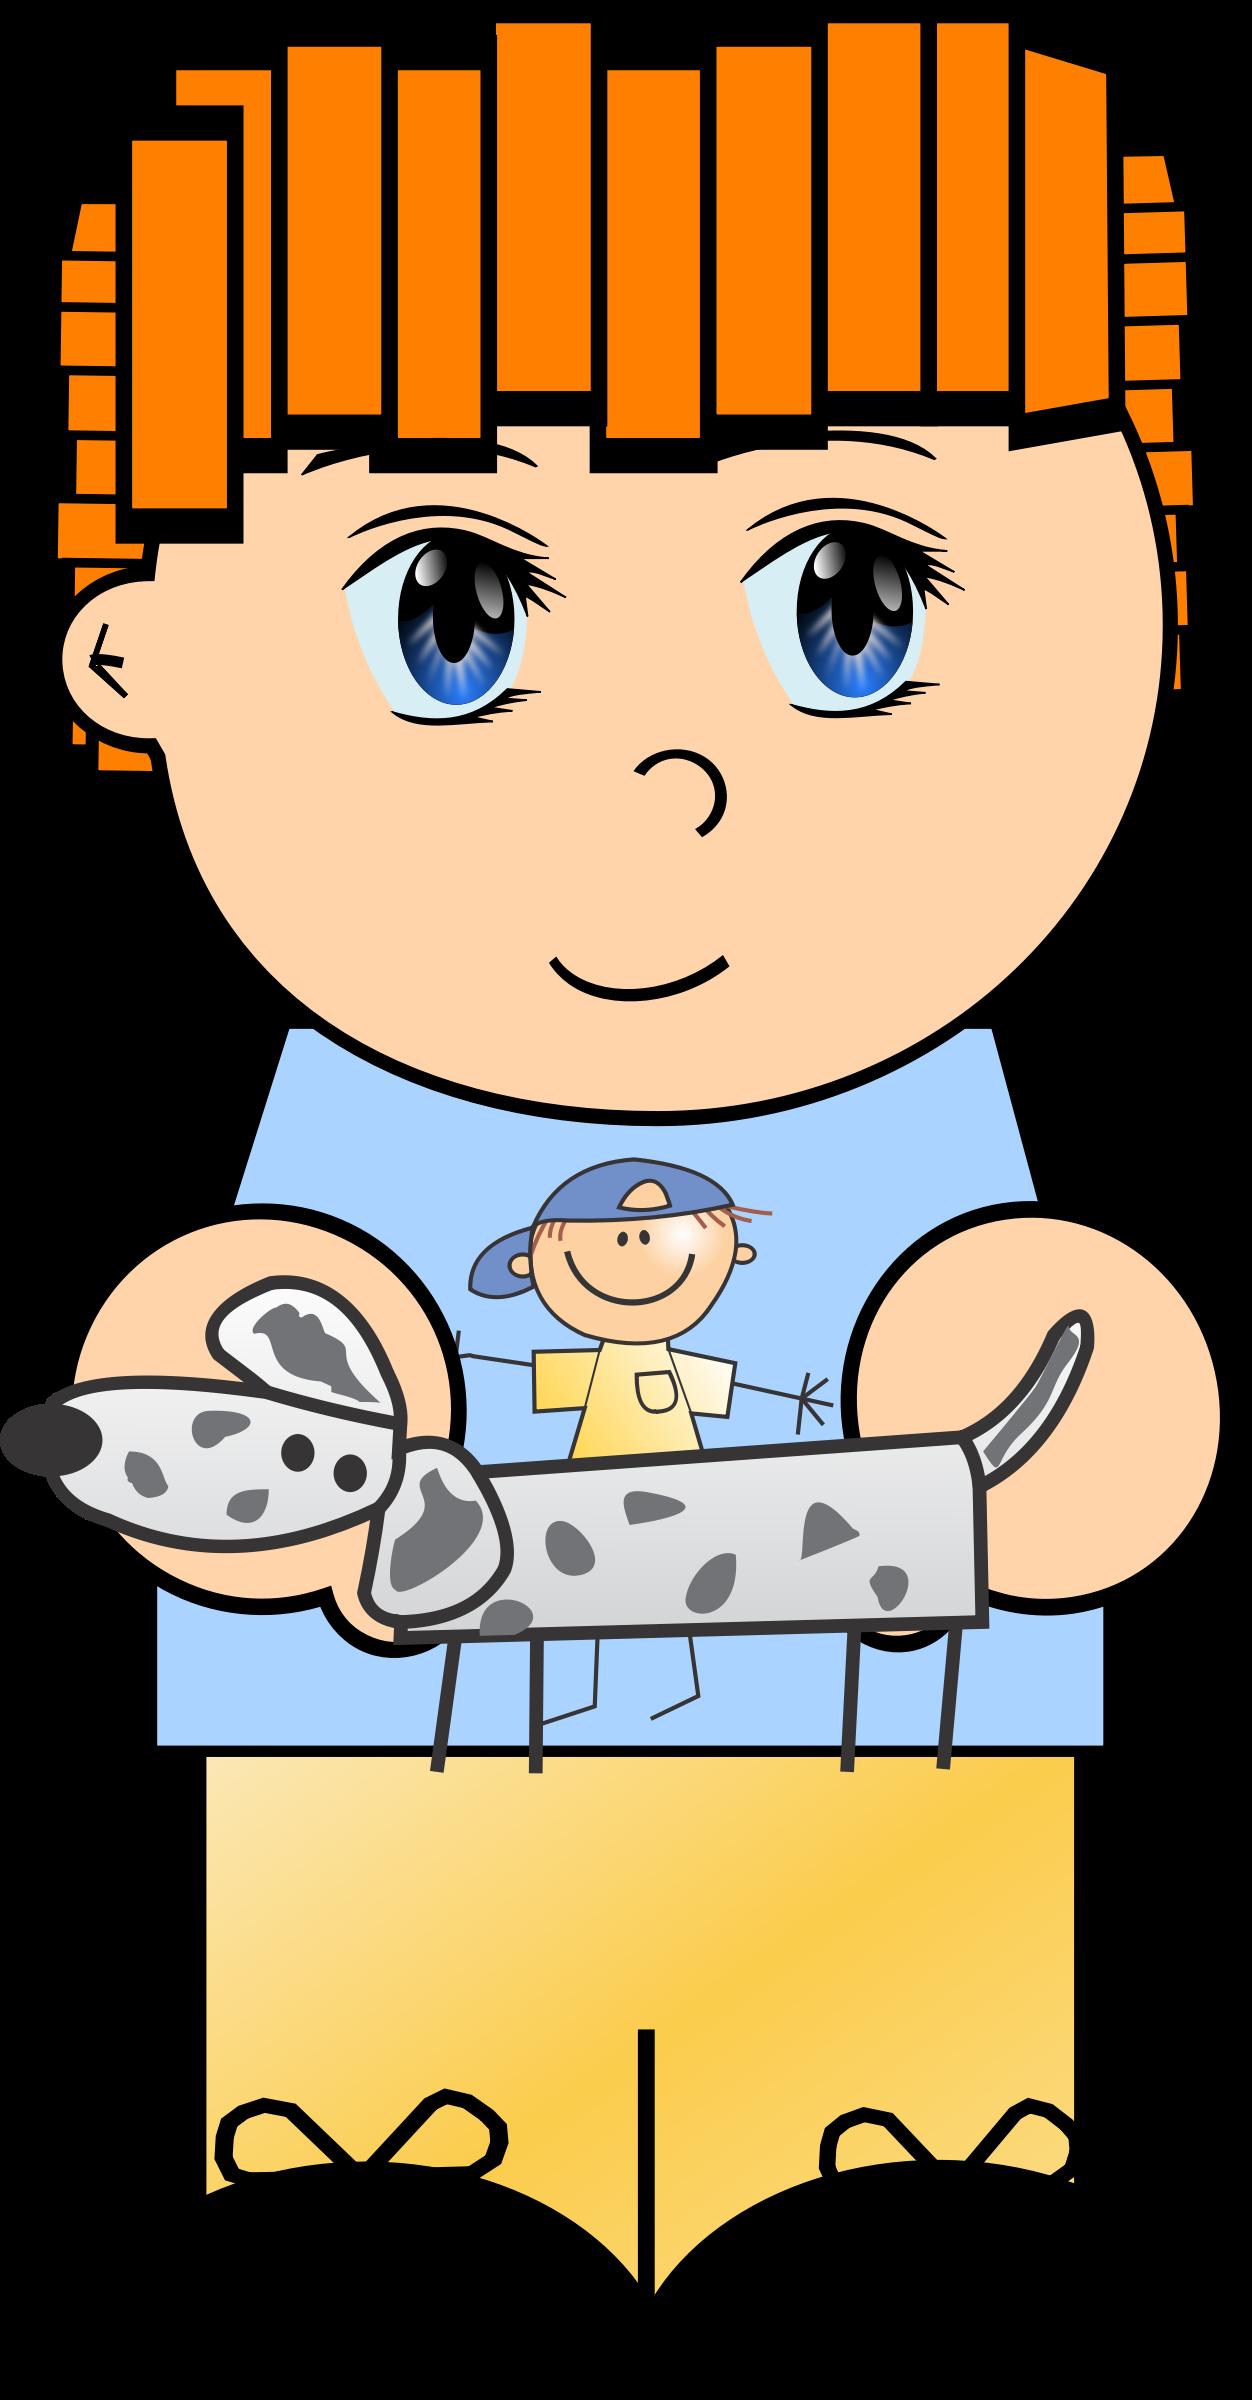 Dog clipart baby. Cartoon boy with big